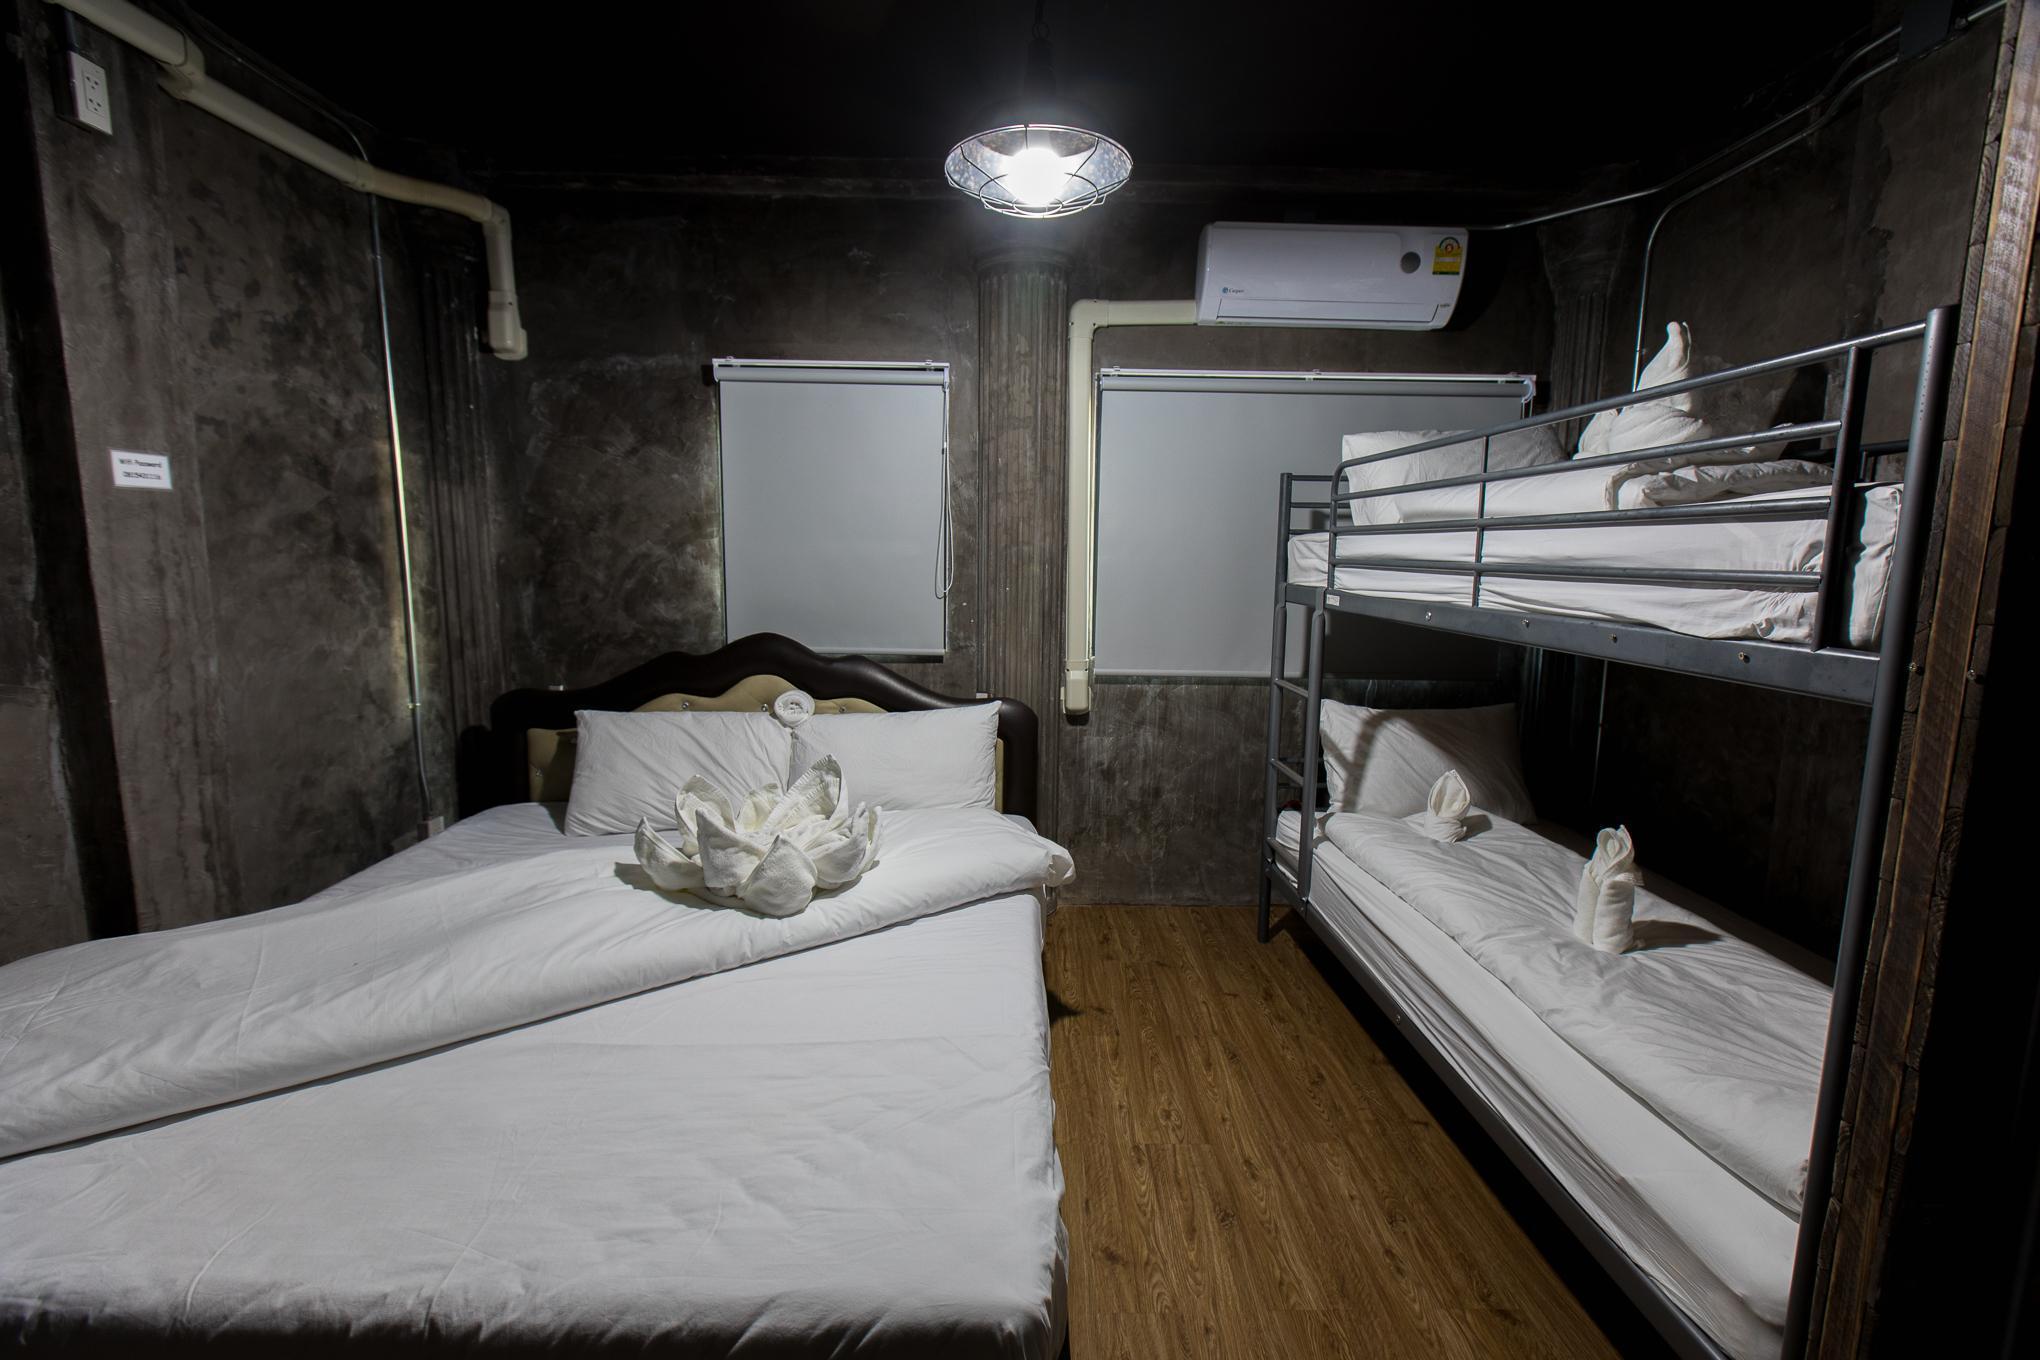 BB wong sawang Room No.2 / Loft style 1 min to MRT BB wong sawang Room No.2 / Loft style 1 min to MRT